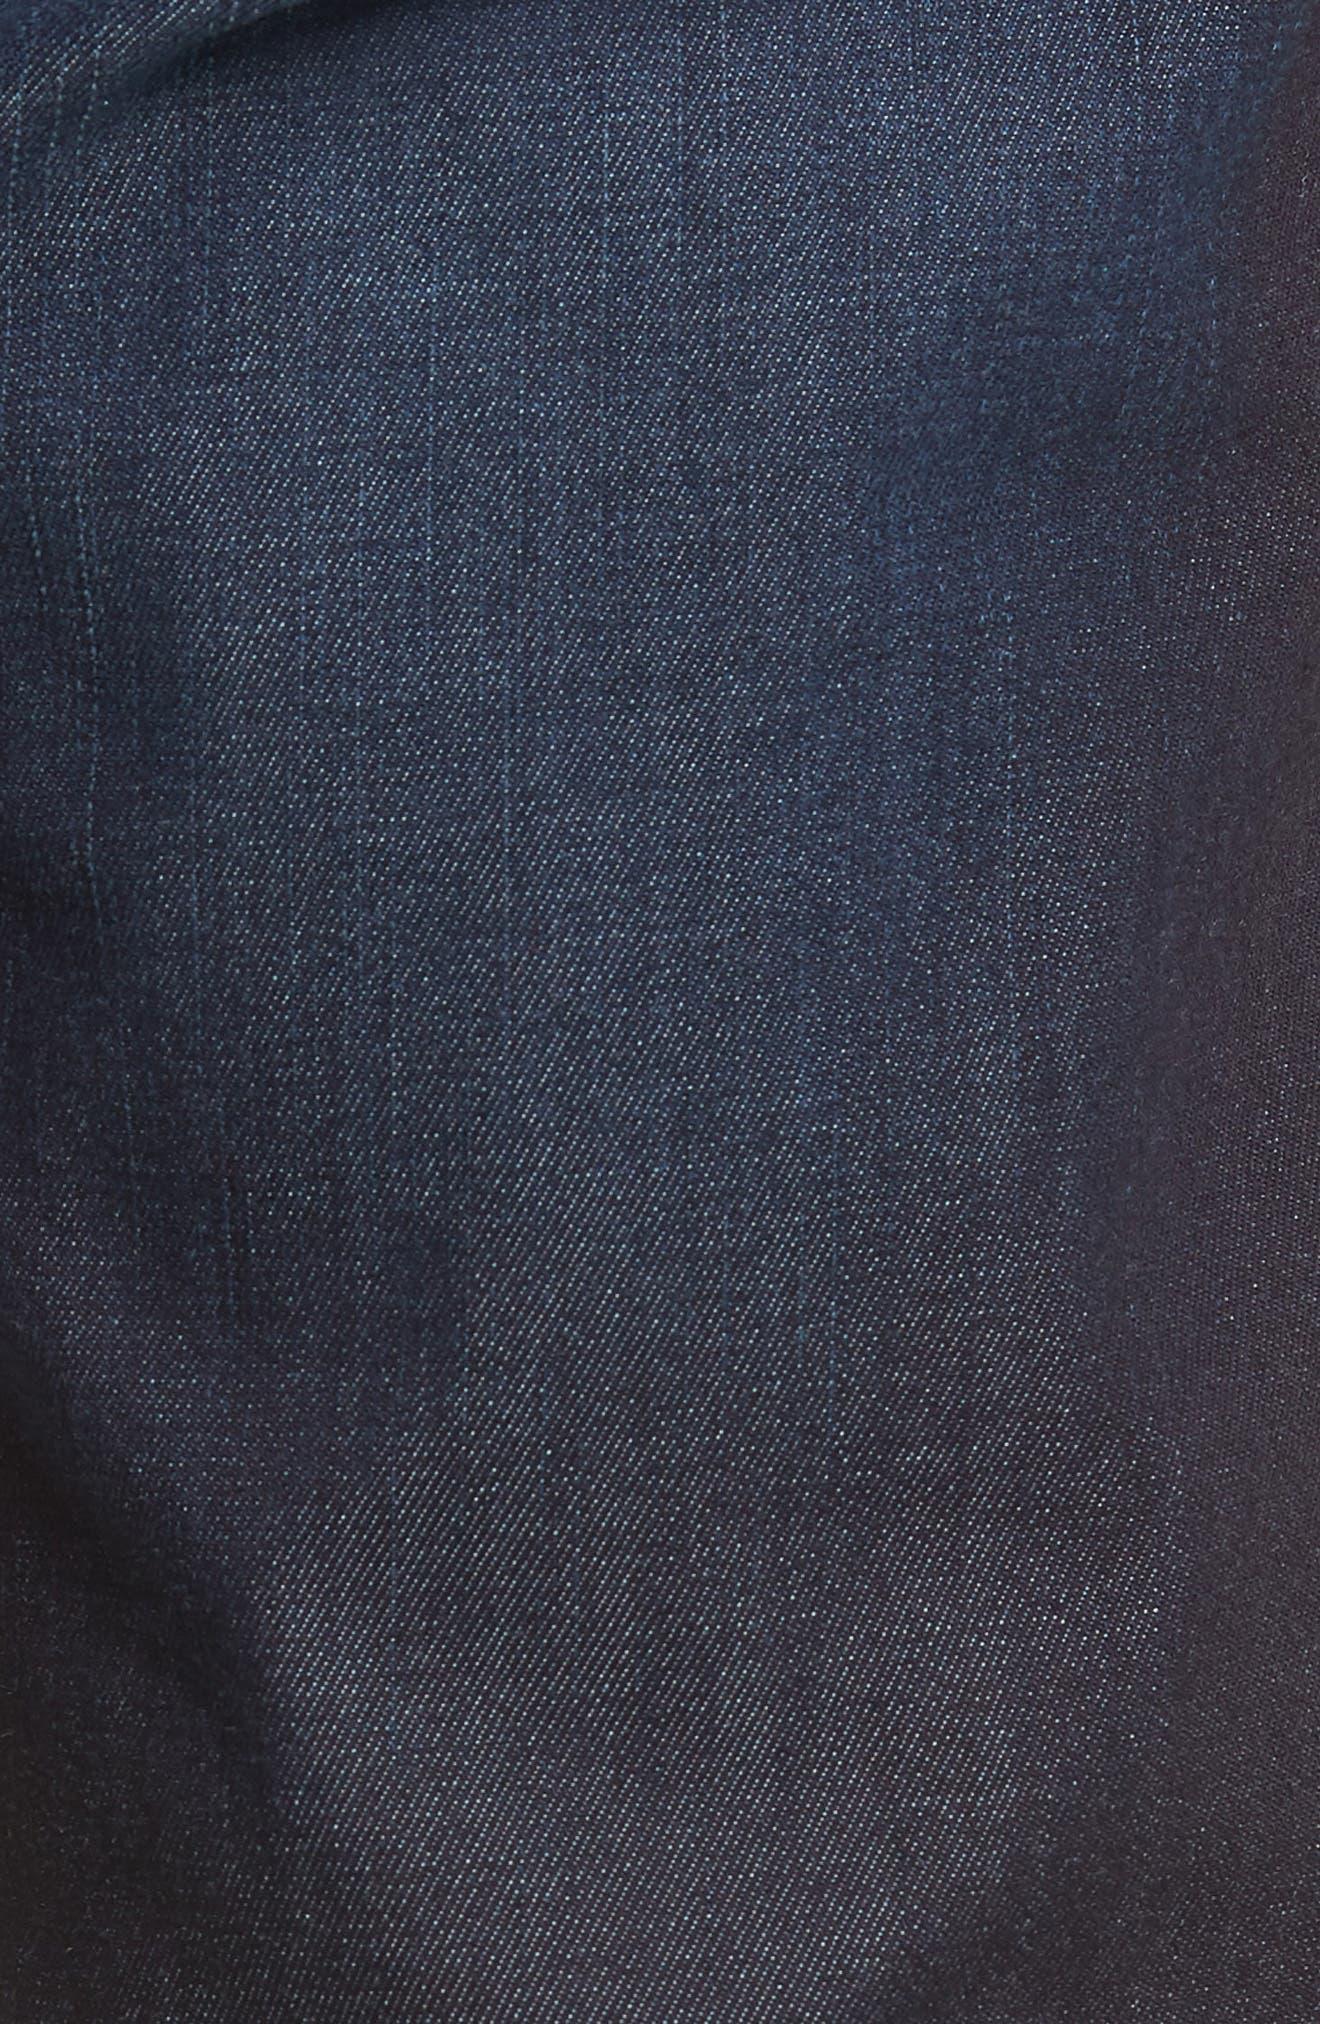 Delaware Slim Fit Jeans,                             Alternate thumbnail 5, color,